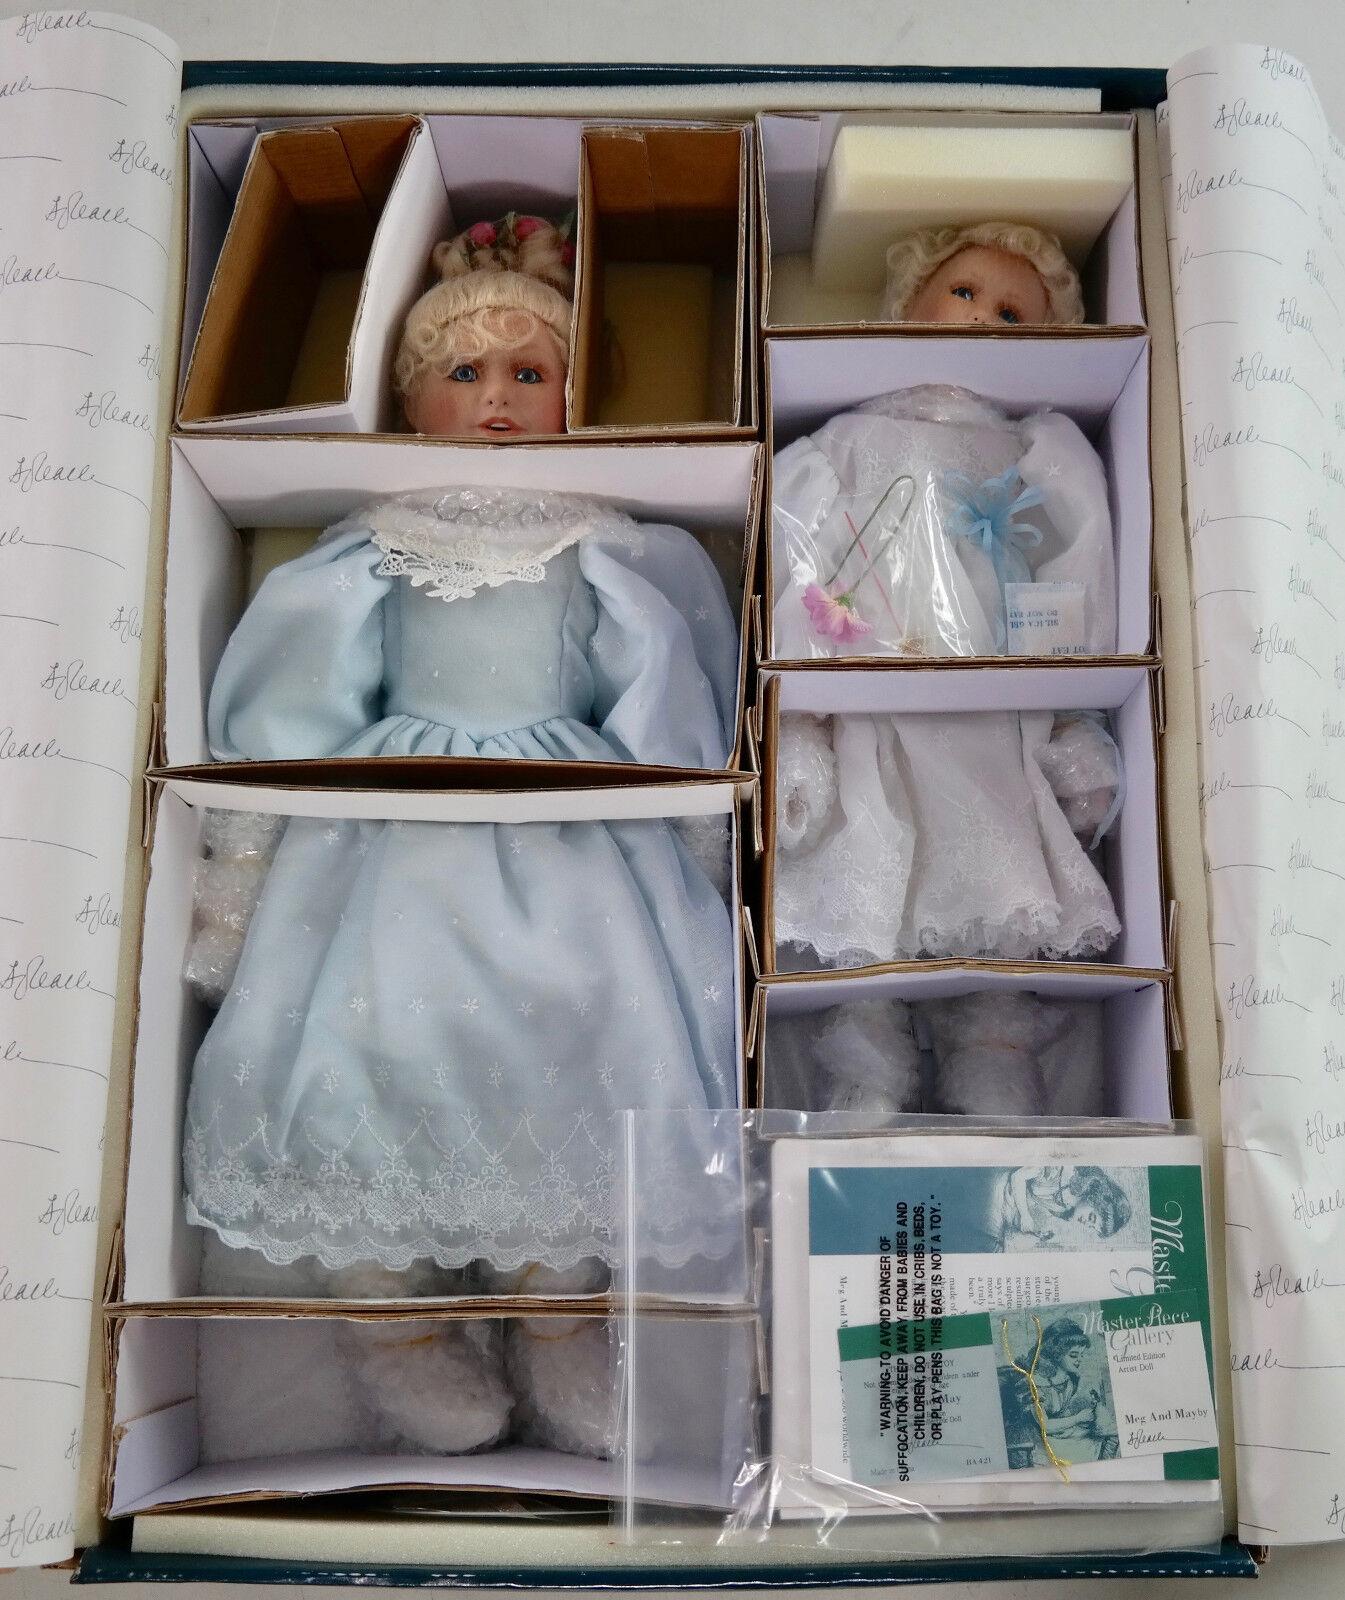 Rare MasterPiece Gallery  Meg & May  Ltd Edition S. Joy Calhoon Porcelain Dolls